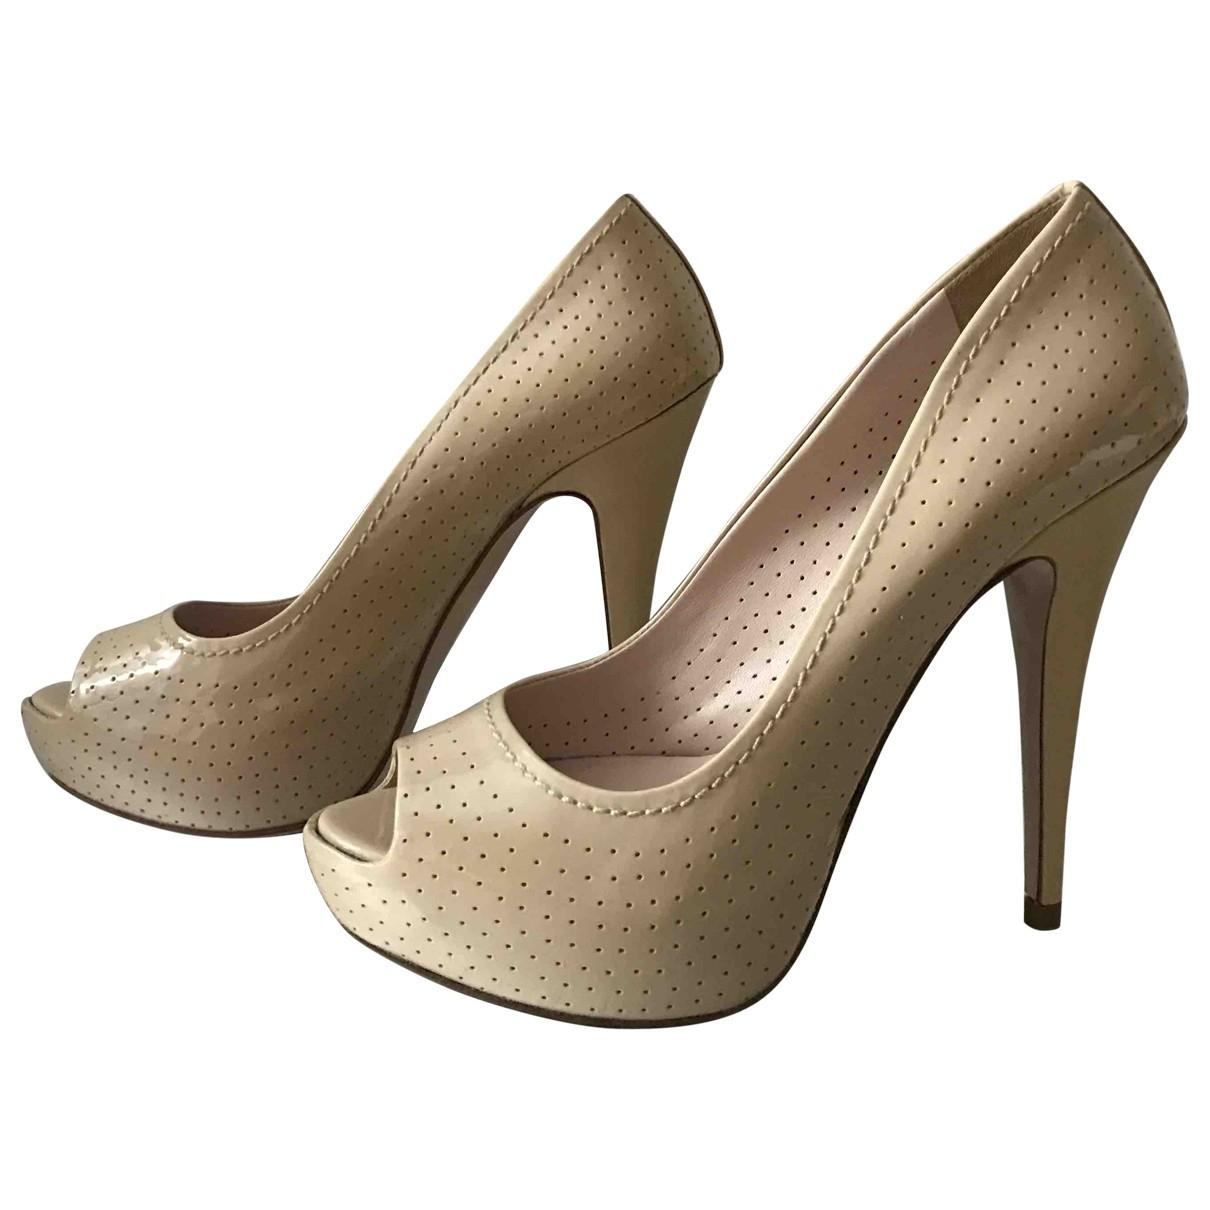 Miu Miu \N Patent leather Heels for Women 37 EU